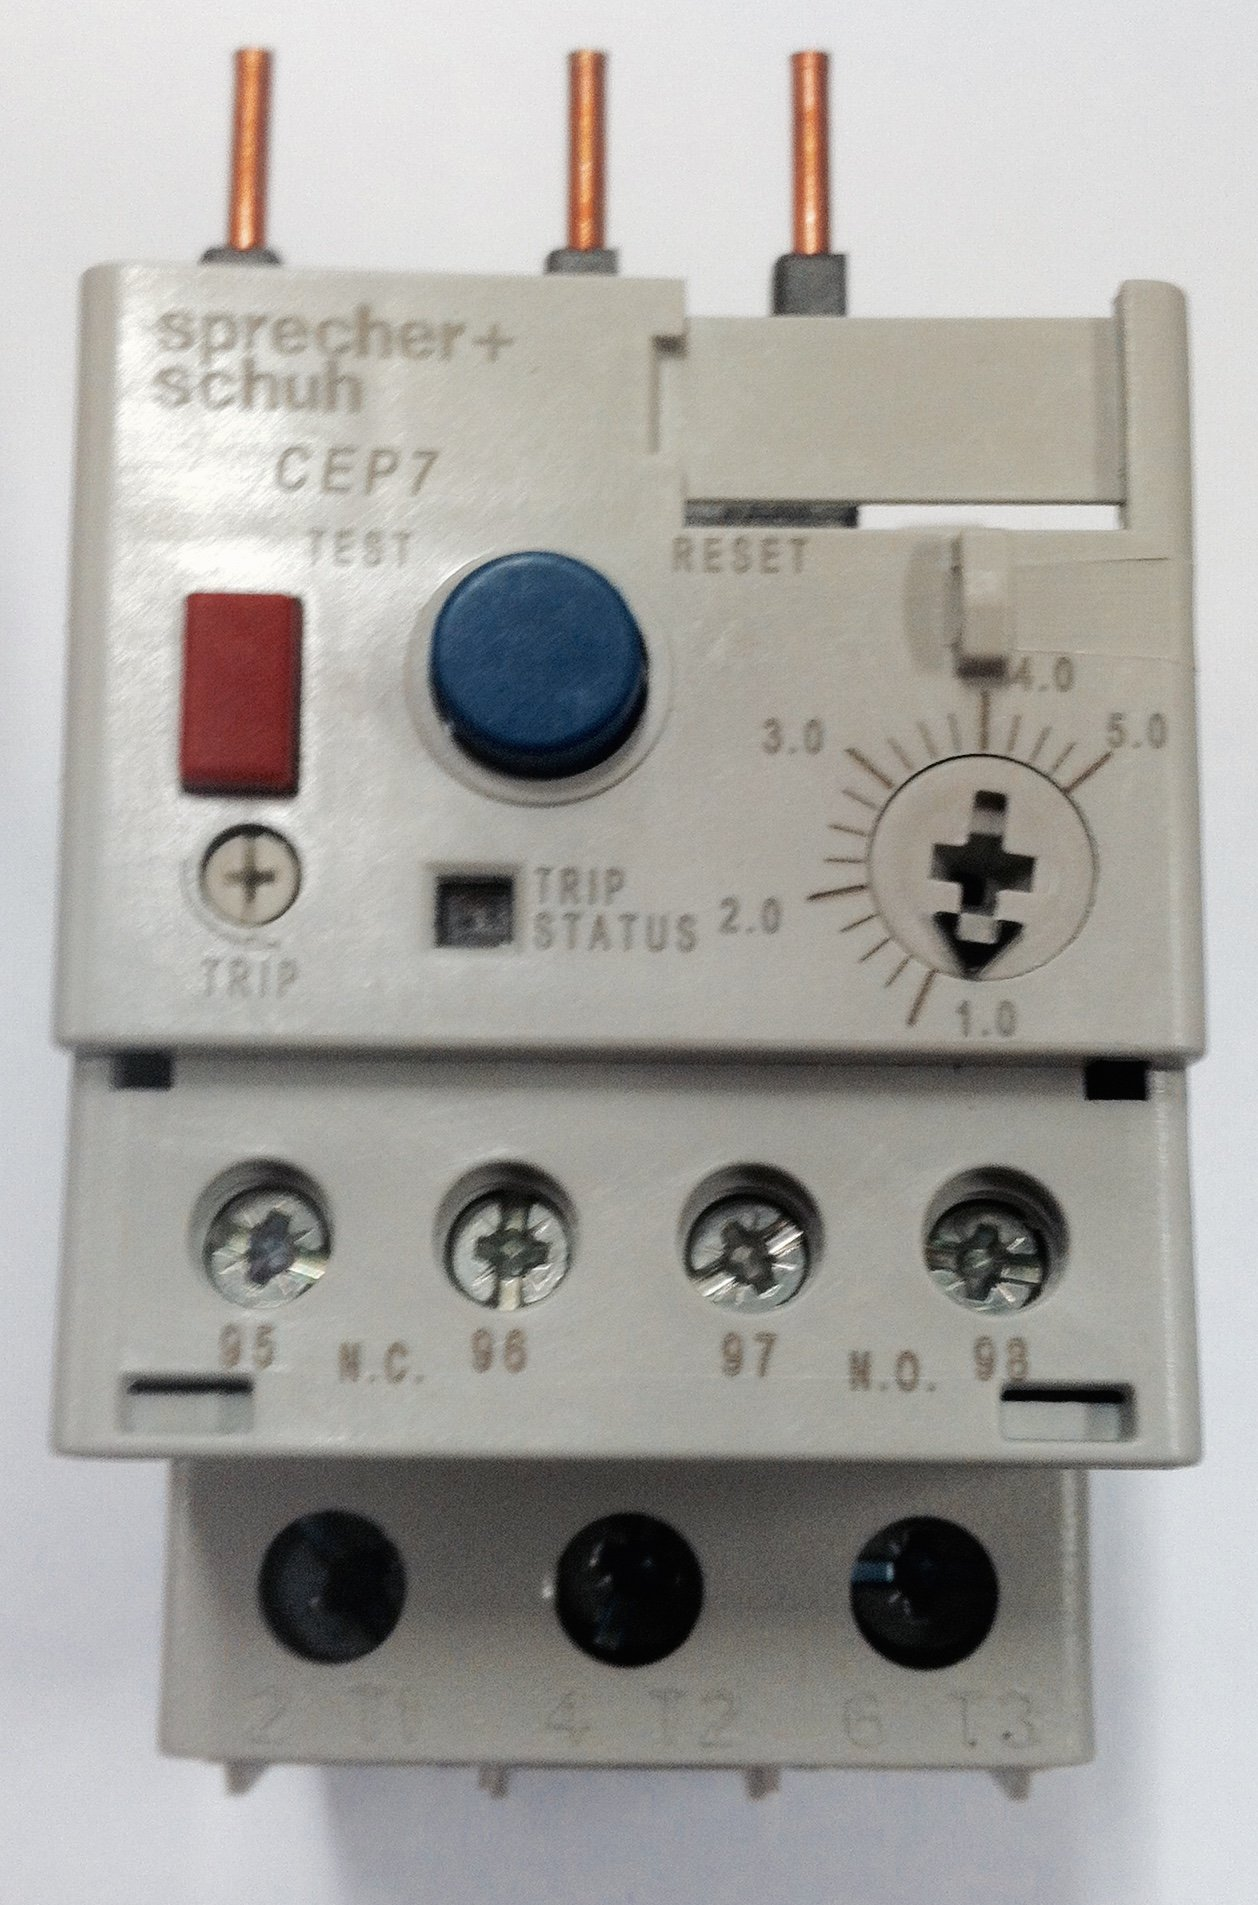 Sprecher & Schuh CEP7-EECB